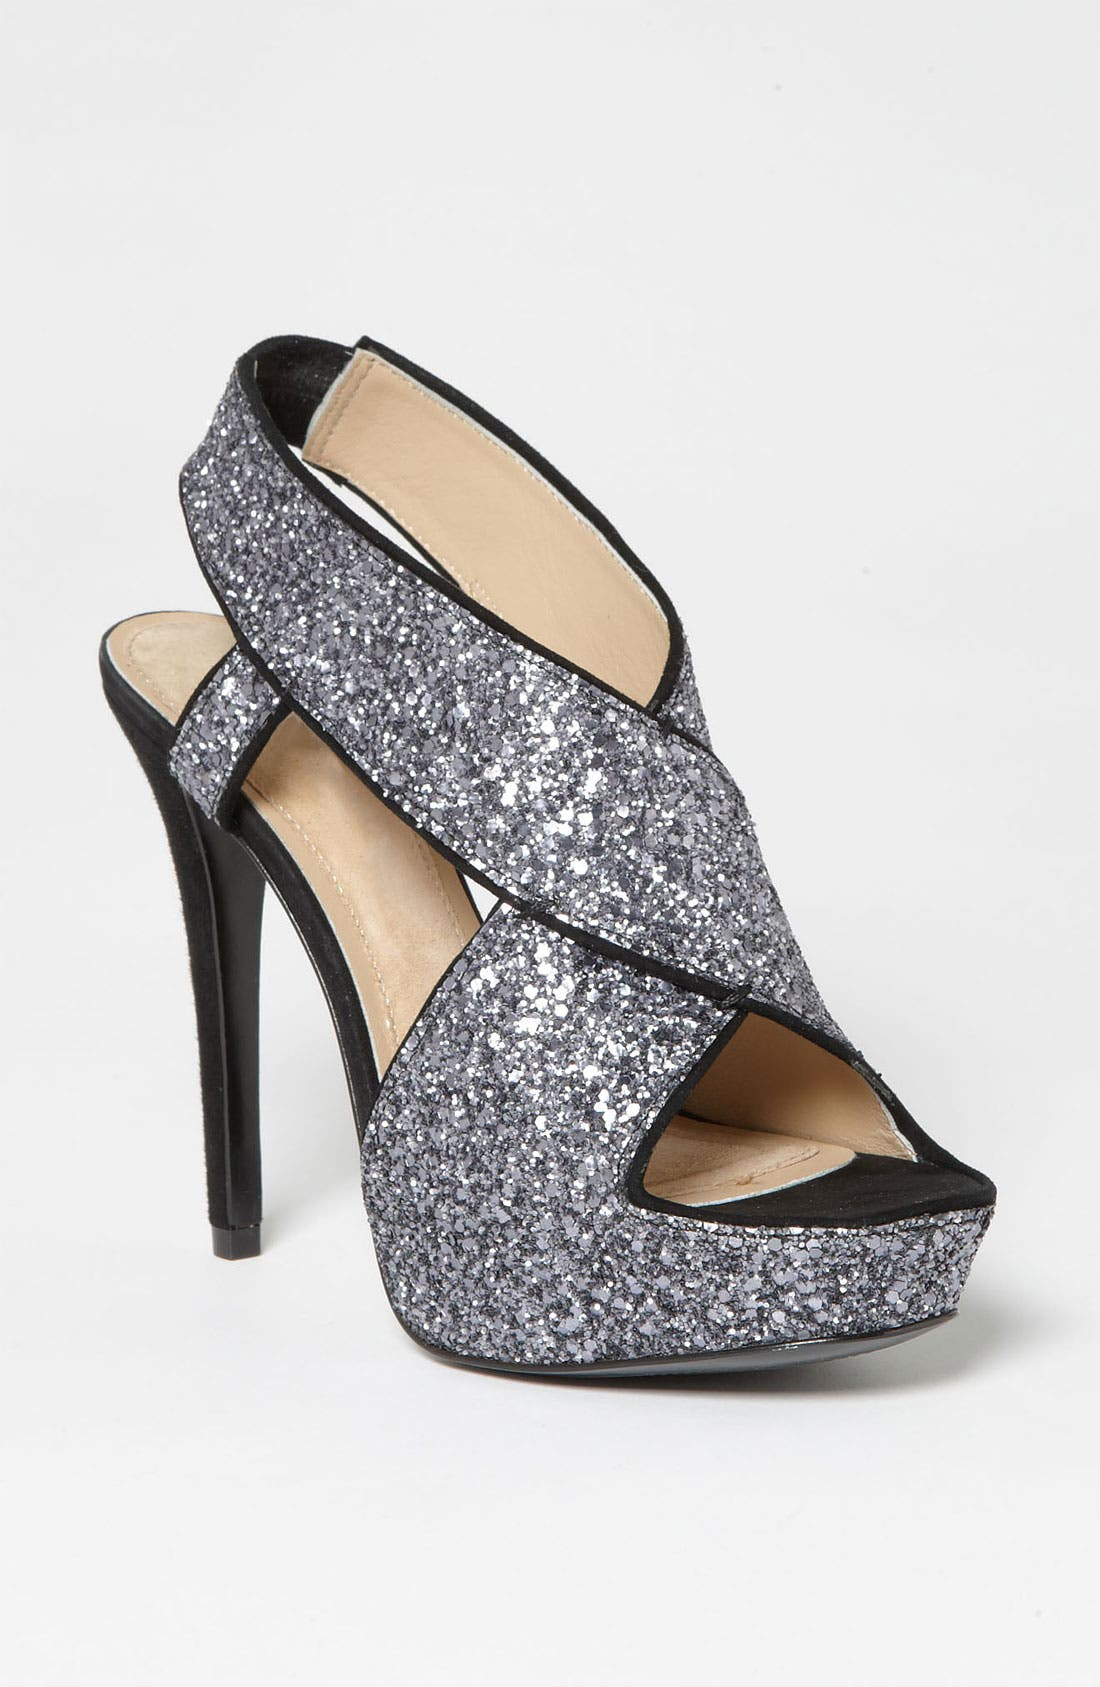 Alternate Image 1 Selected - Diane von Furstenberg 'Zia' Glitter Sandal